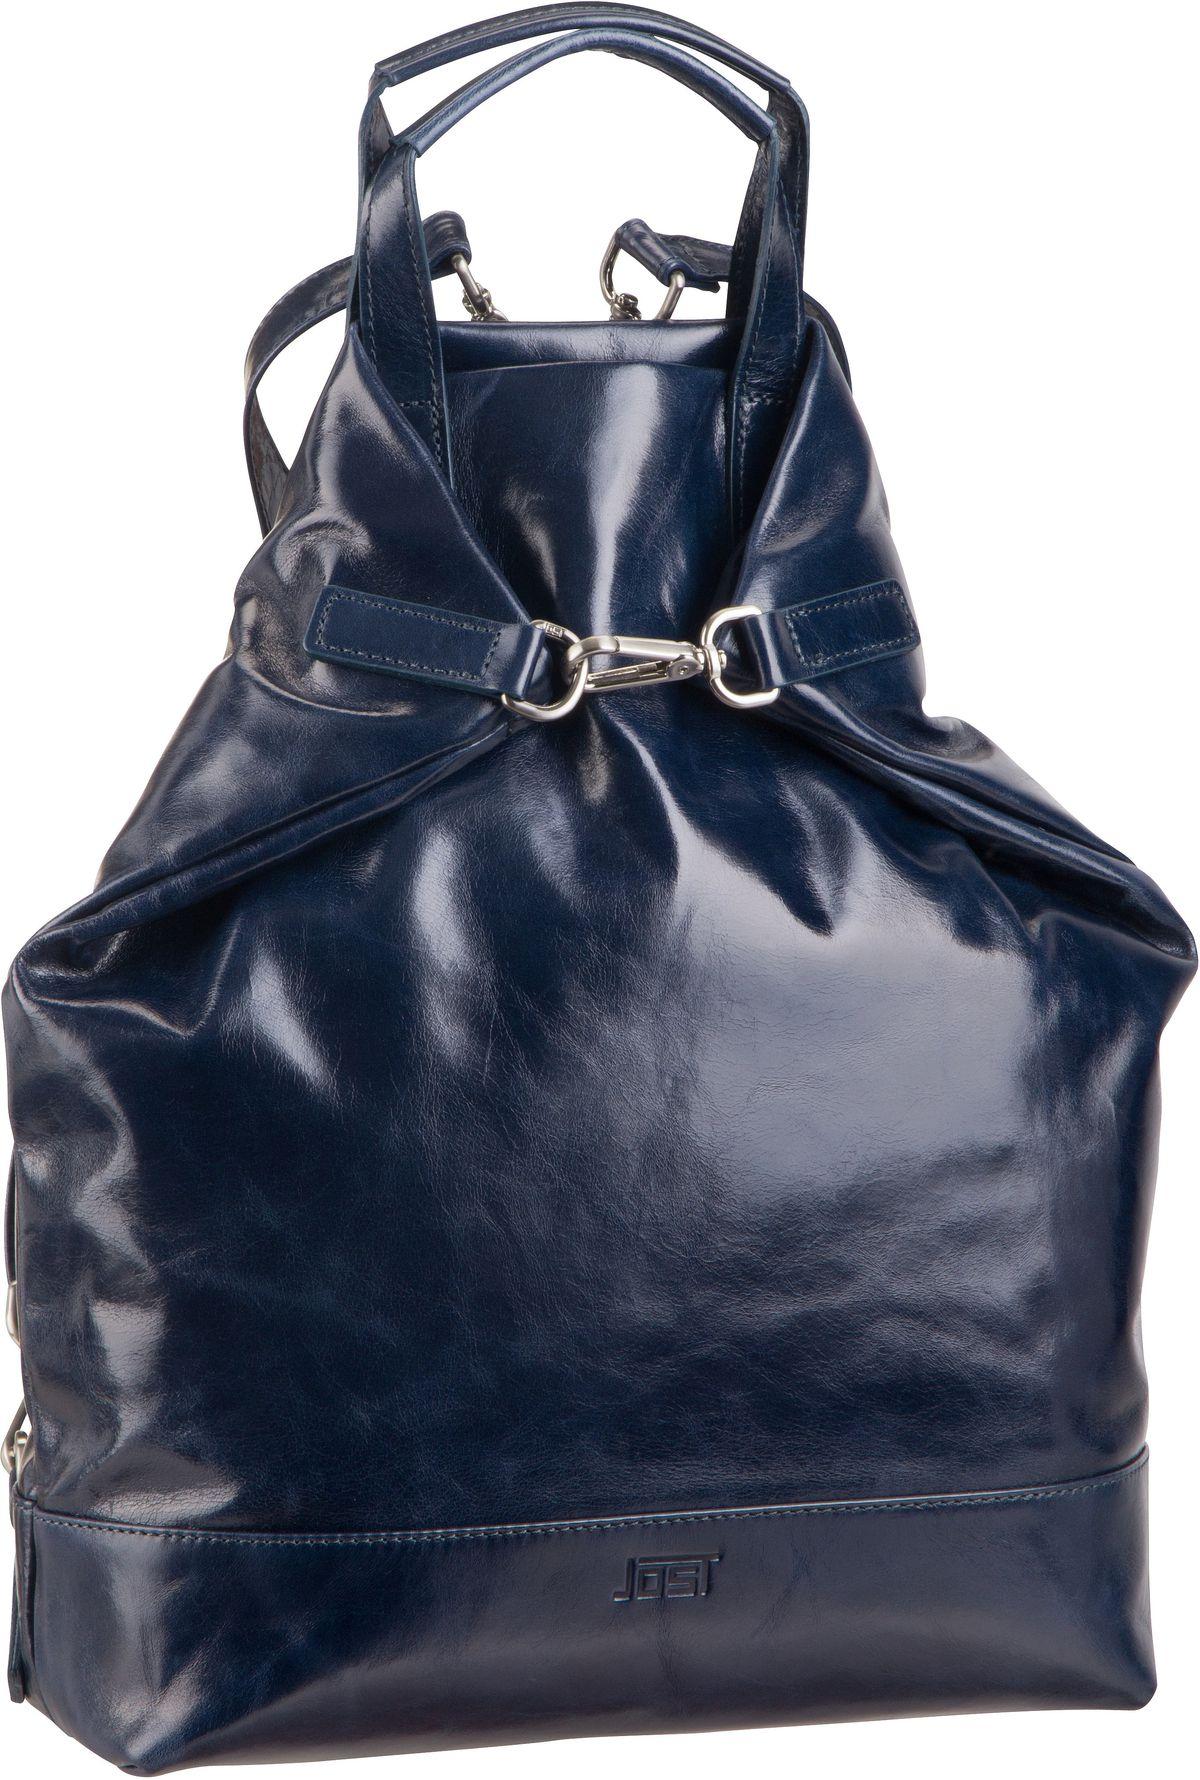 Rucksack / Daypack Boda 6625 X-Change Bag S Navy